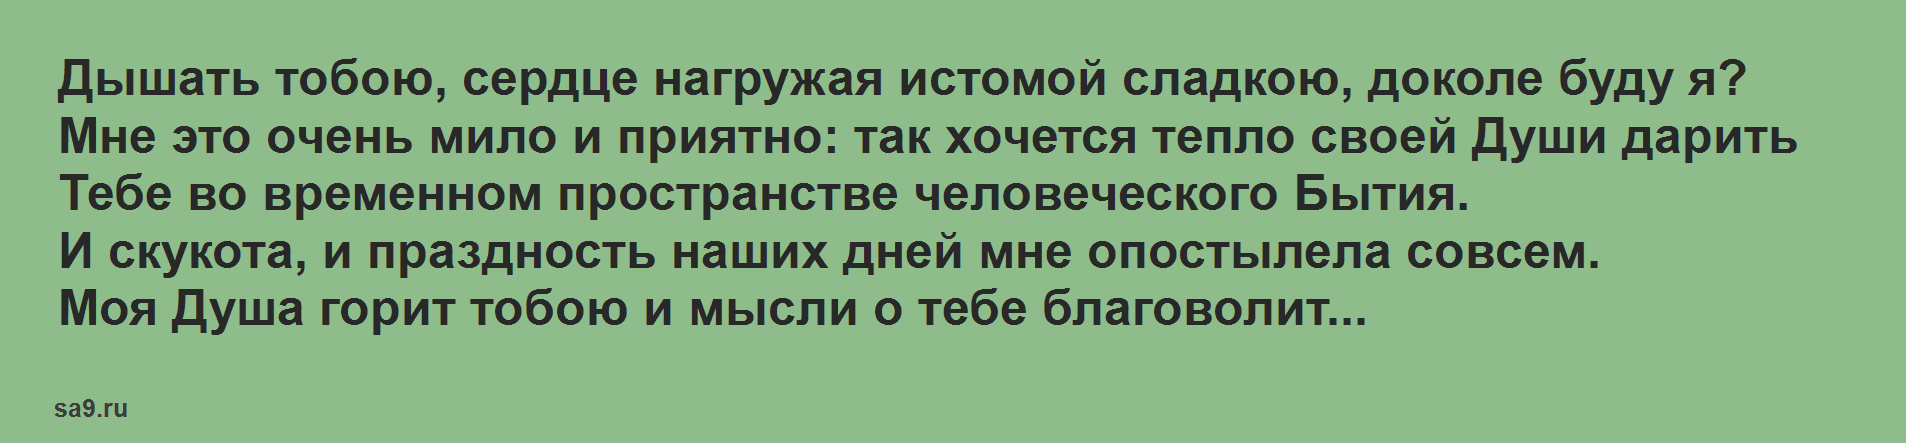 Короткие стихи Борисова - Душа истомою горит